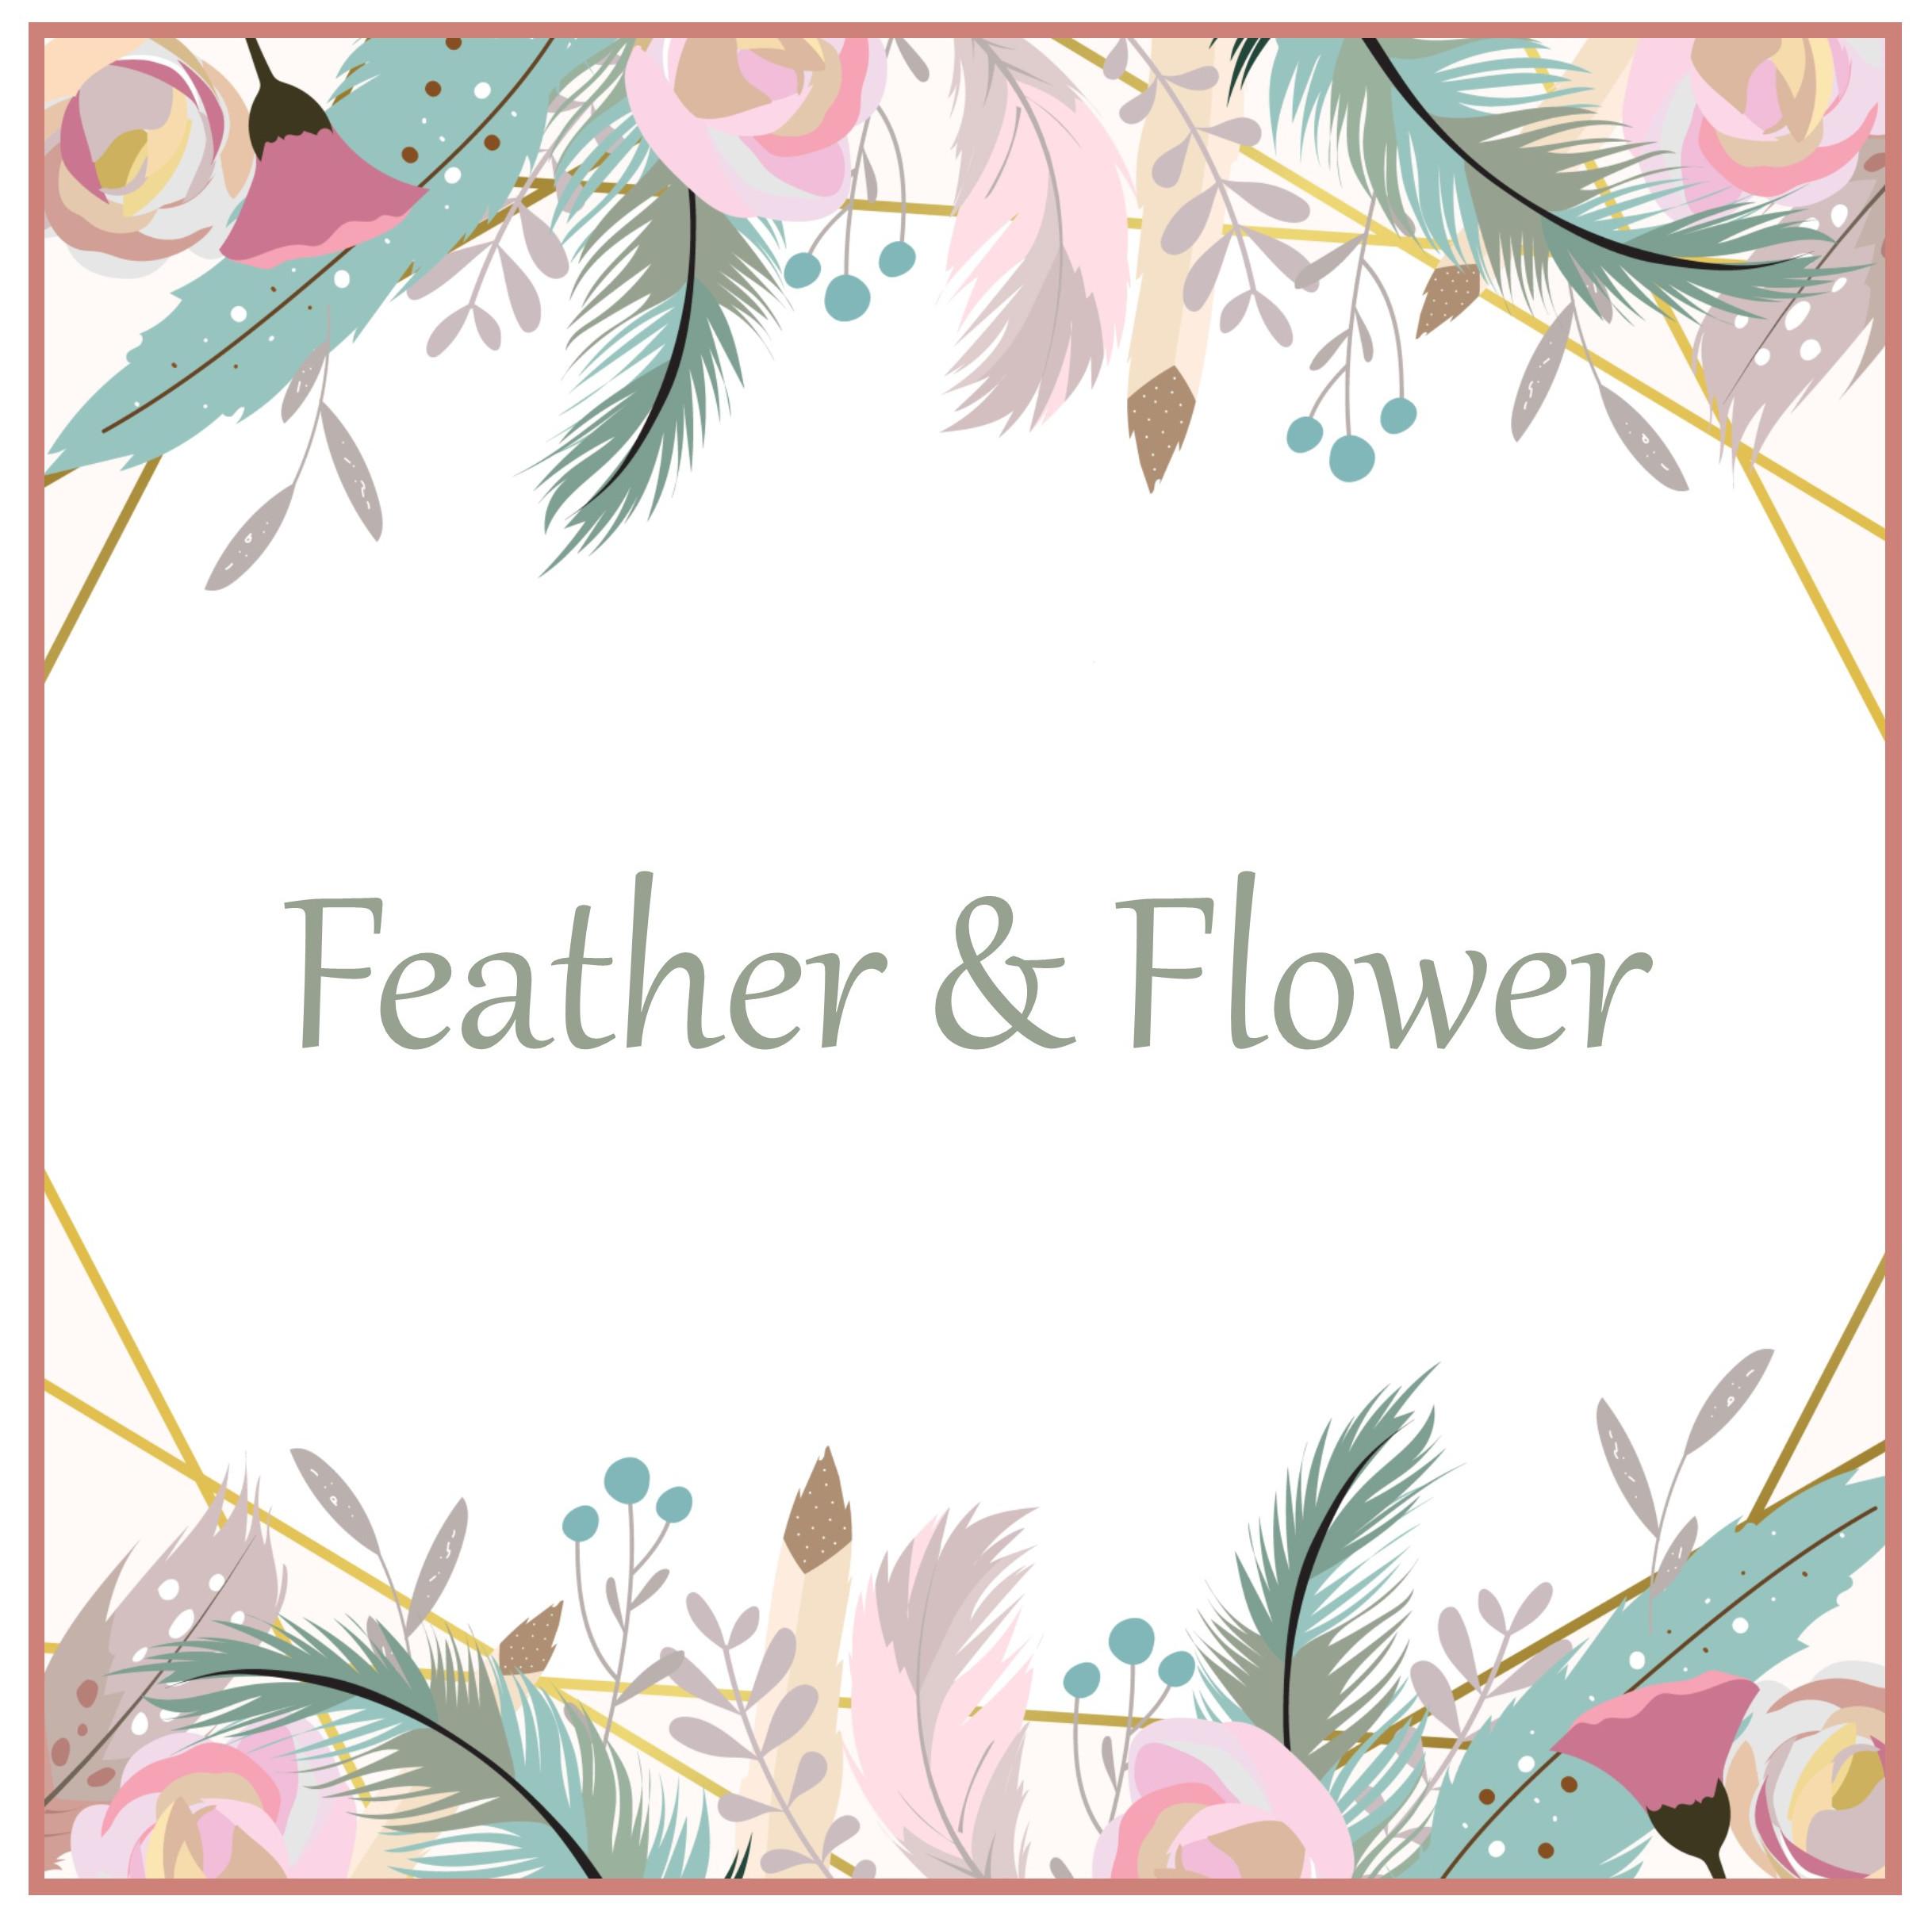 Feather & Flower.jpg